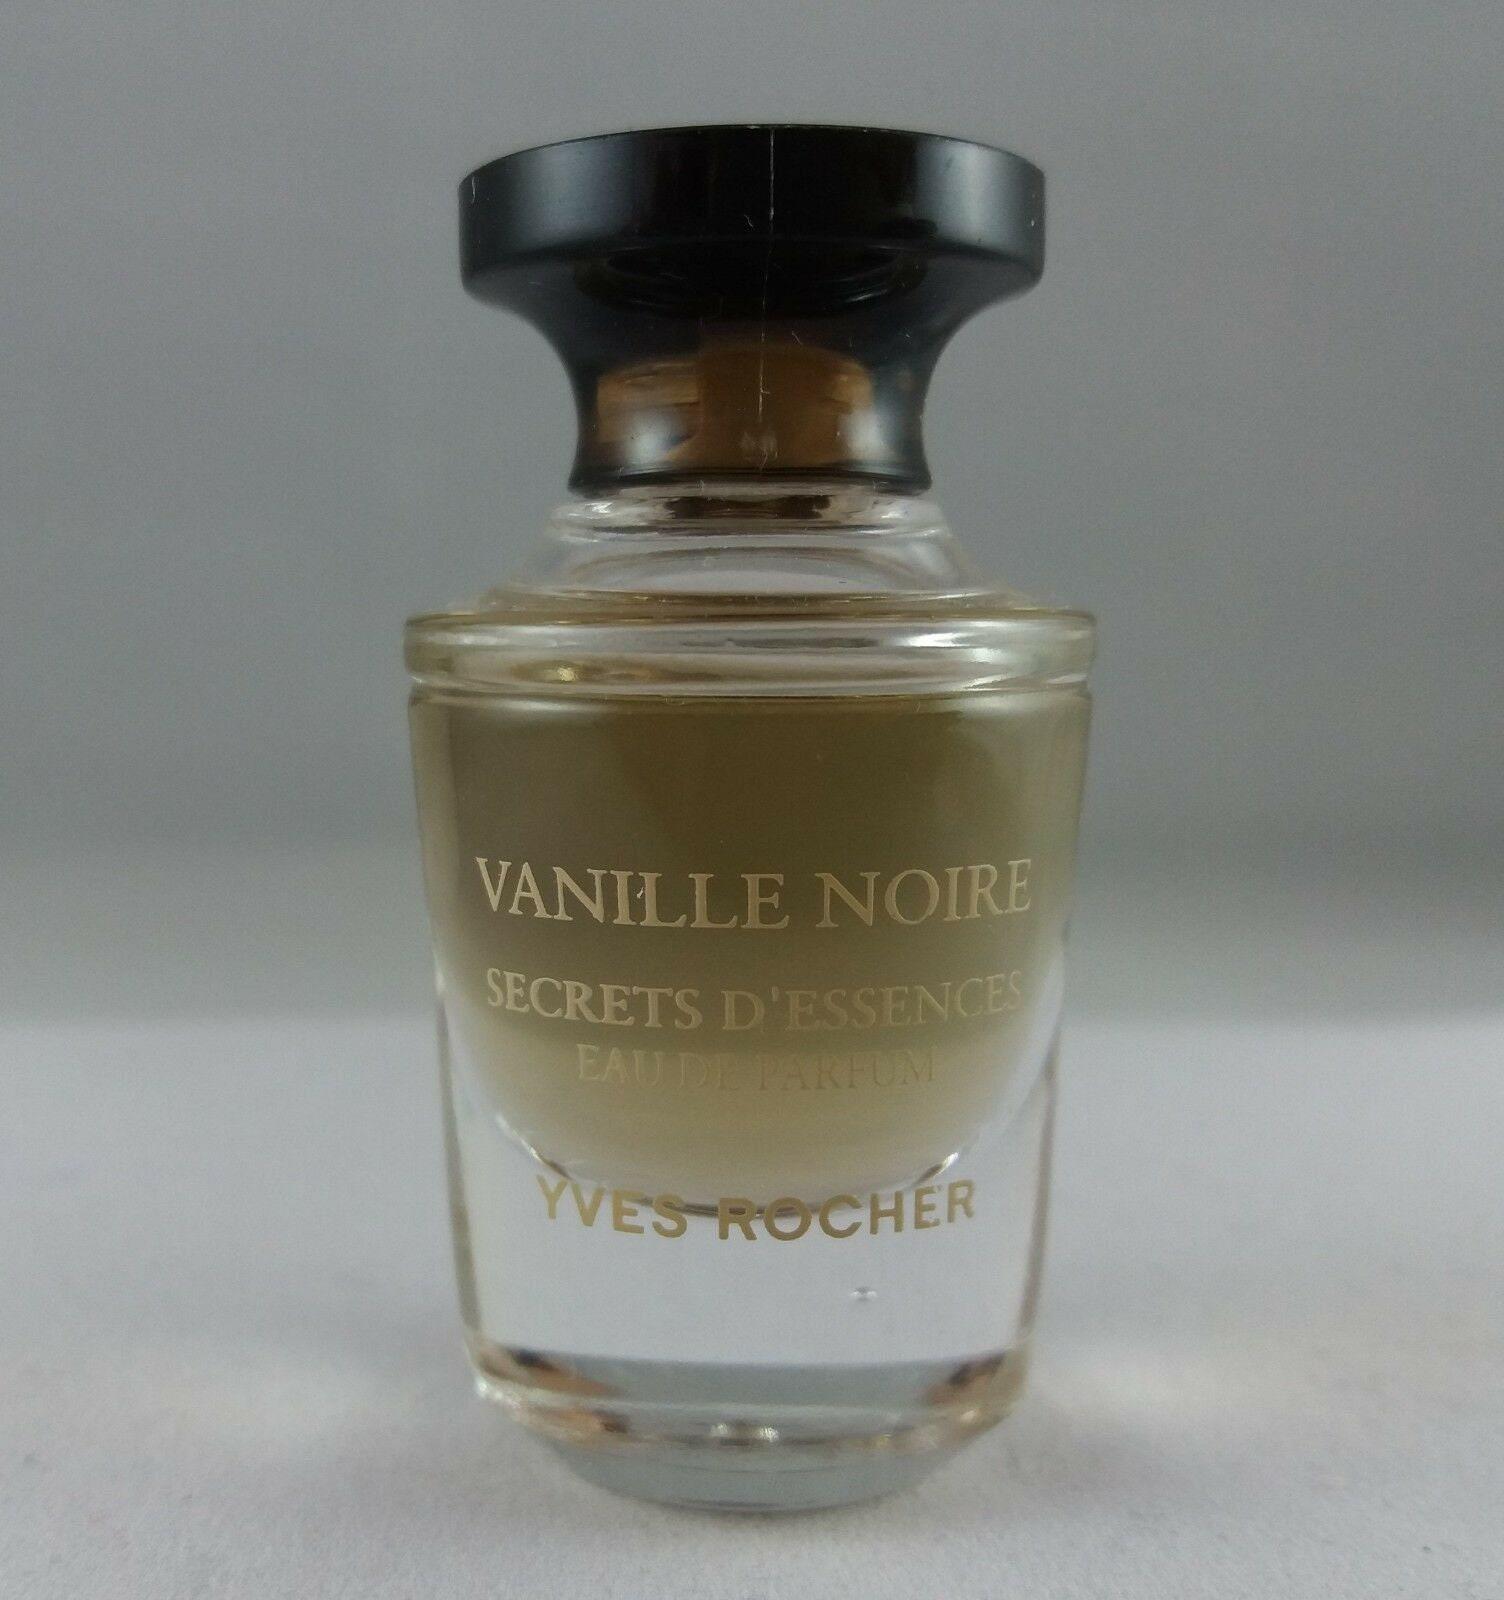 Rocher De Noire Toilette Vanille Perfume Eau Miniatureetsy Yves 3ql5aj4r mvny0w8ON